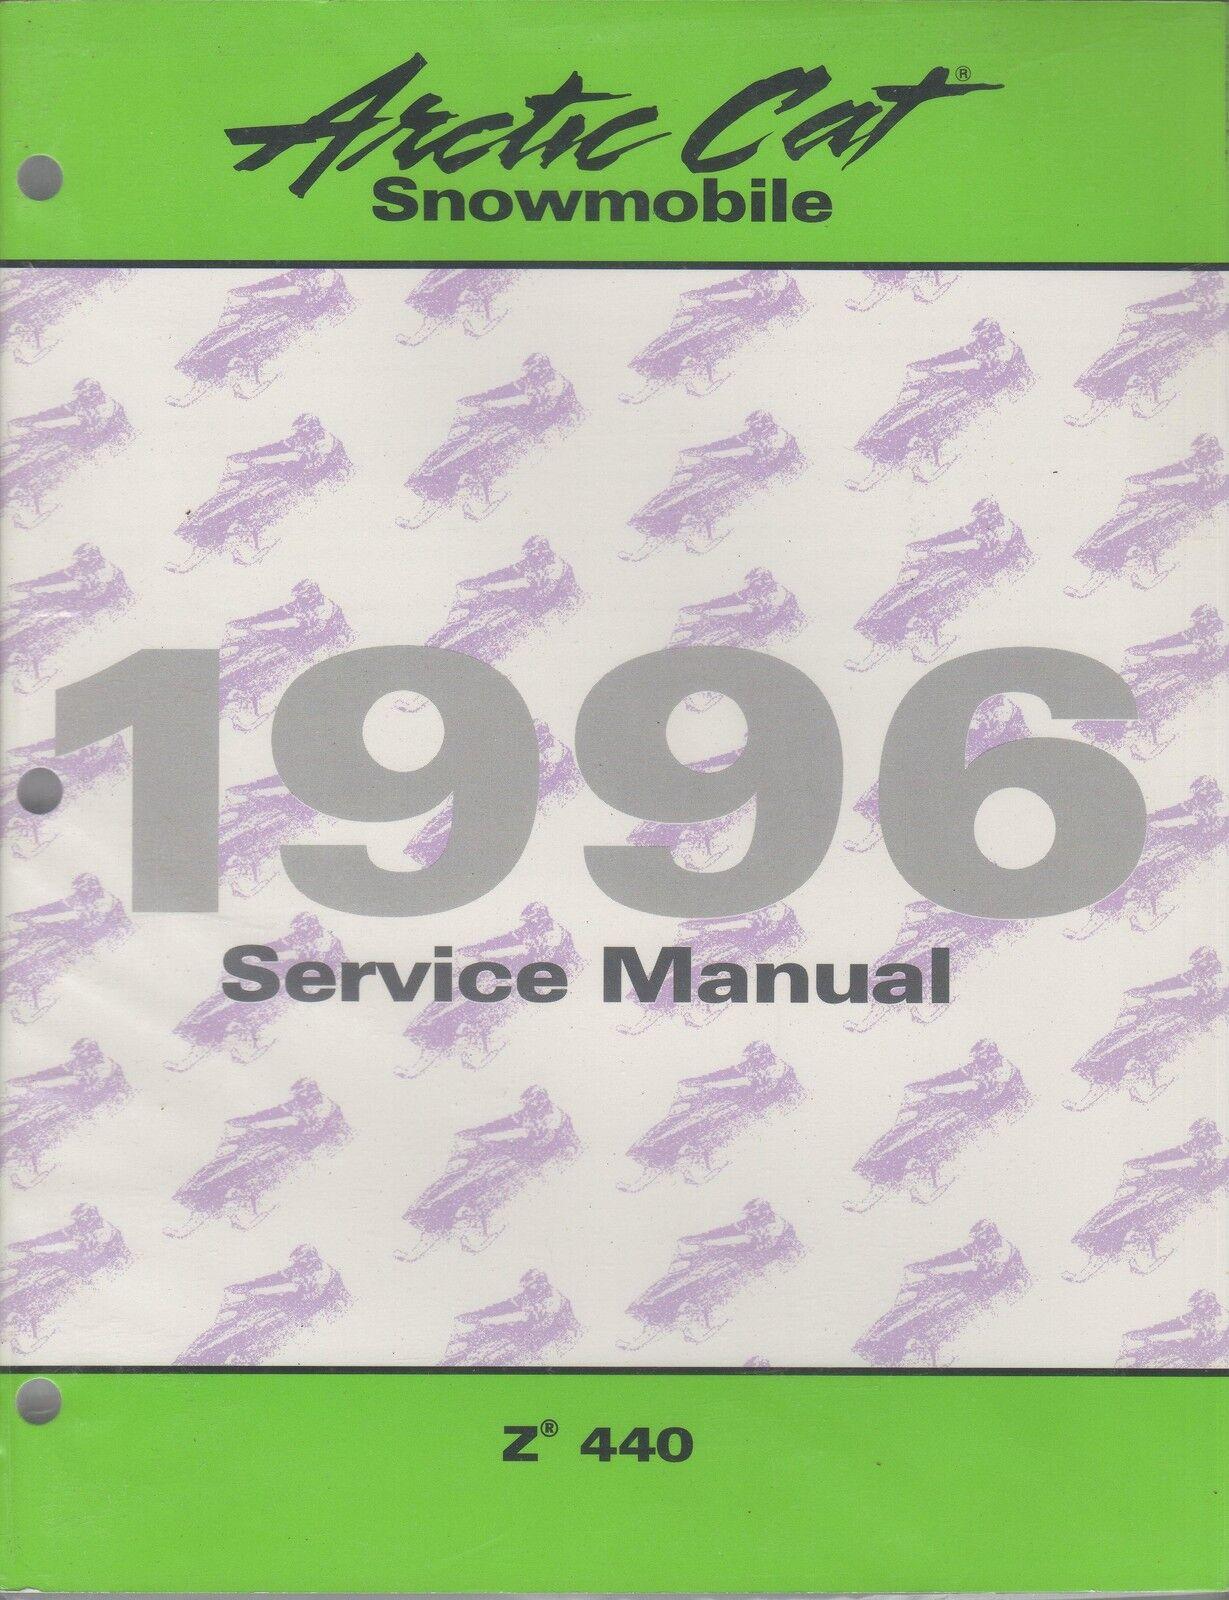 1996  ARCTIC CAT SNOWMOBILE  Z 440  SERVICE MANUAL PN 2255-308